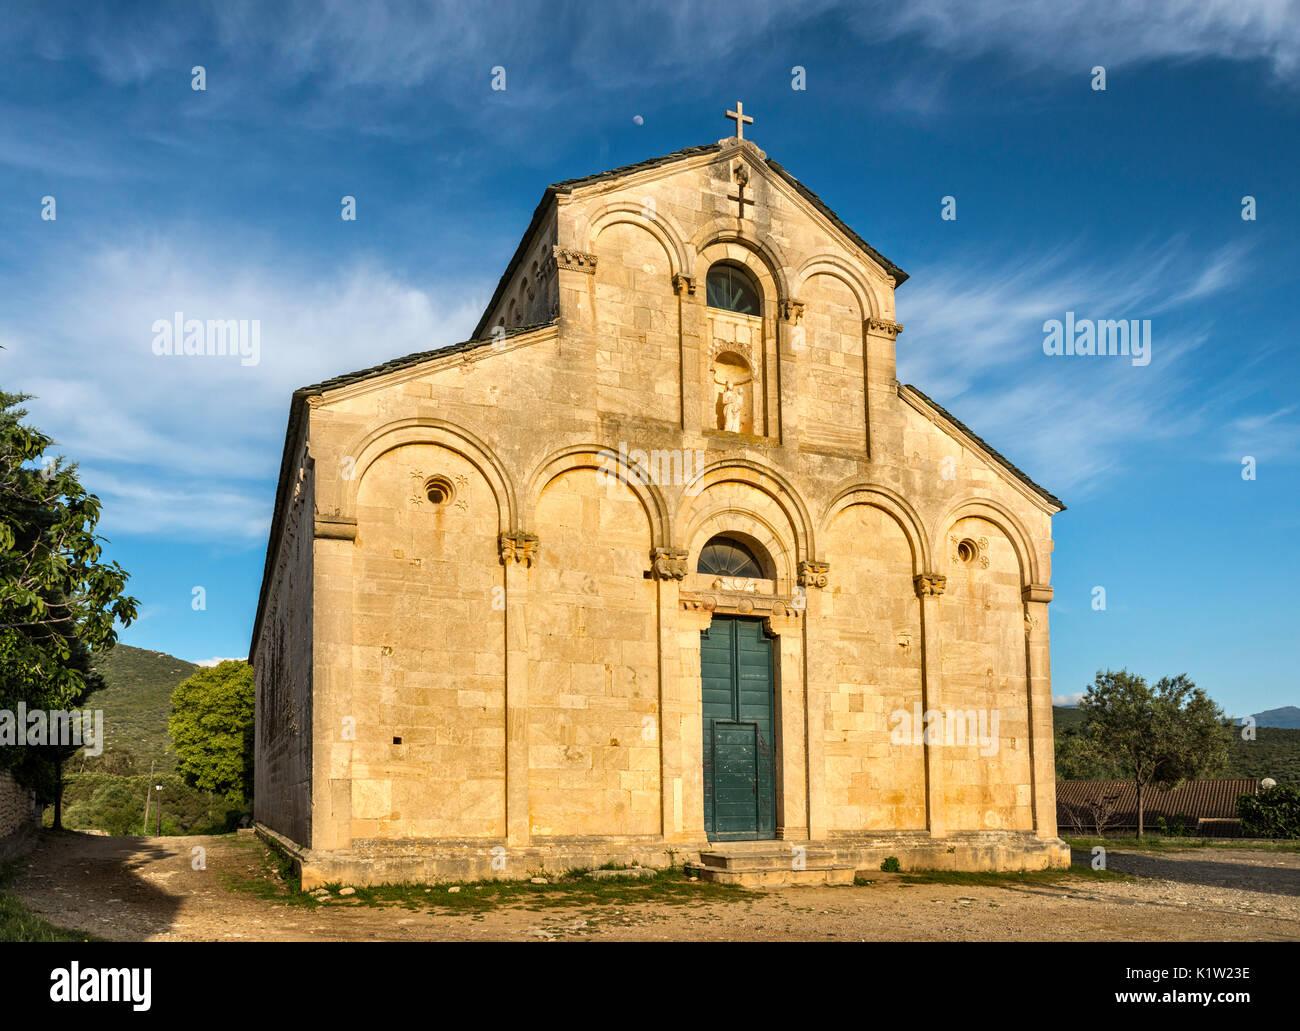 Cathedrale du Nebbio (Santa-Maria-Assunta), Assumption Cathedral, 1140, Romanesque style, in Saint-Florent,  Corsica, France - Stock Image